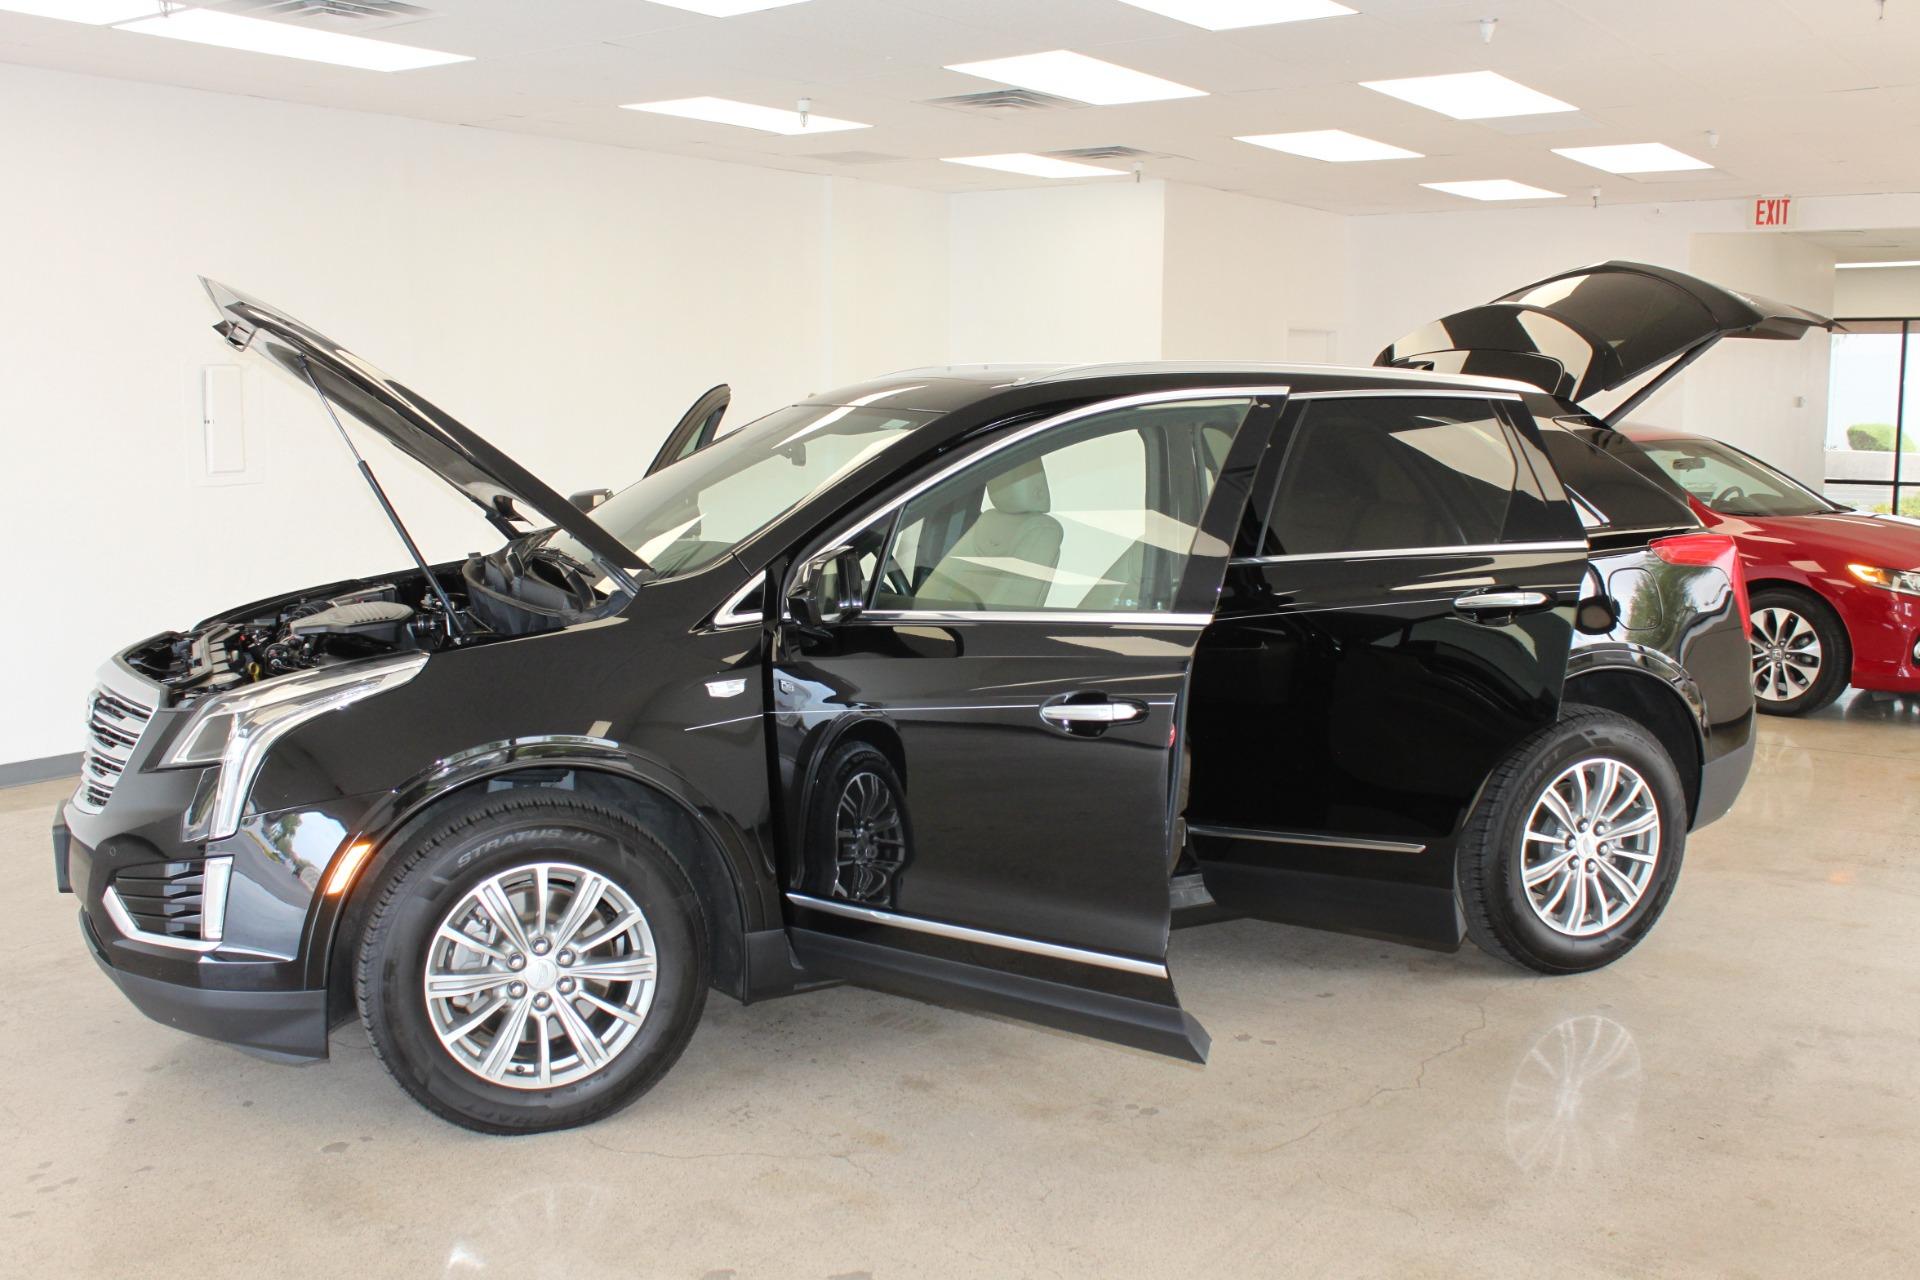 Used-2017-Cadillac-XT5-Luxury-All-Wheel-Drive-Luxury-AWD-XJ